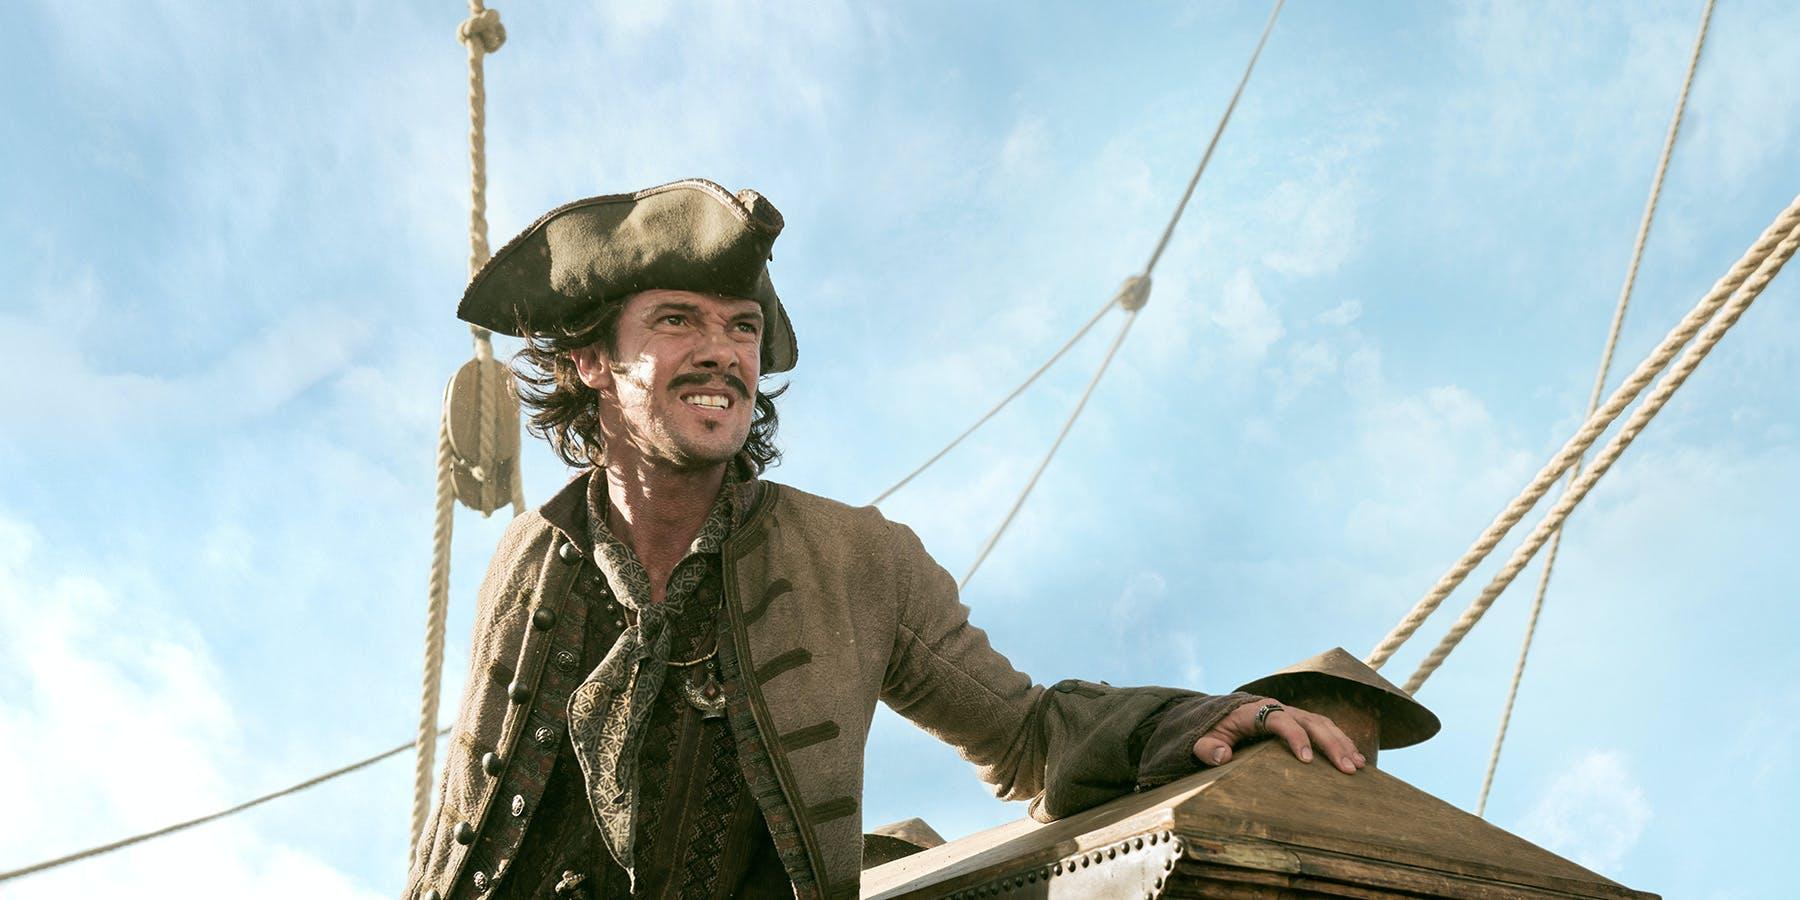 Toby Schmitz as Jack Rackham survives 'Black Sails'